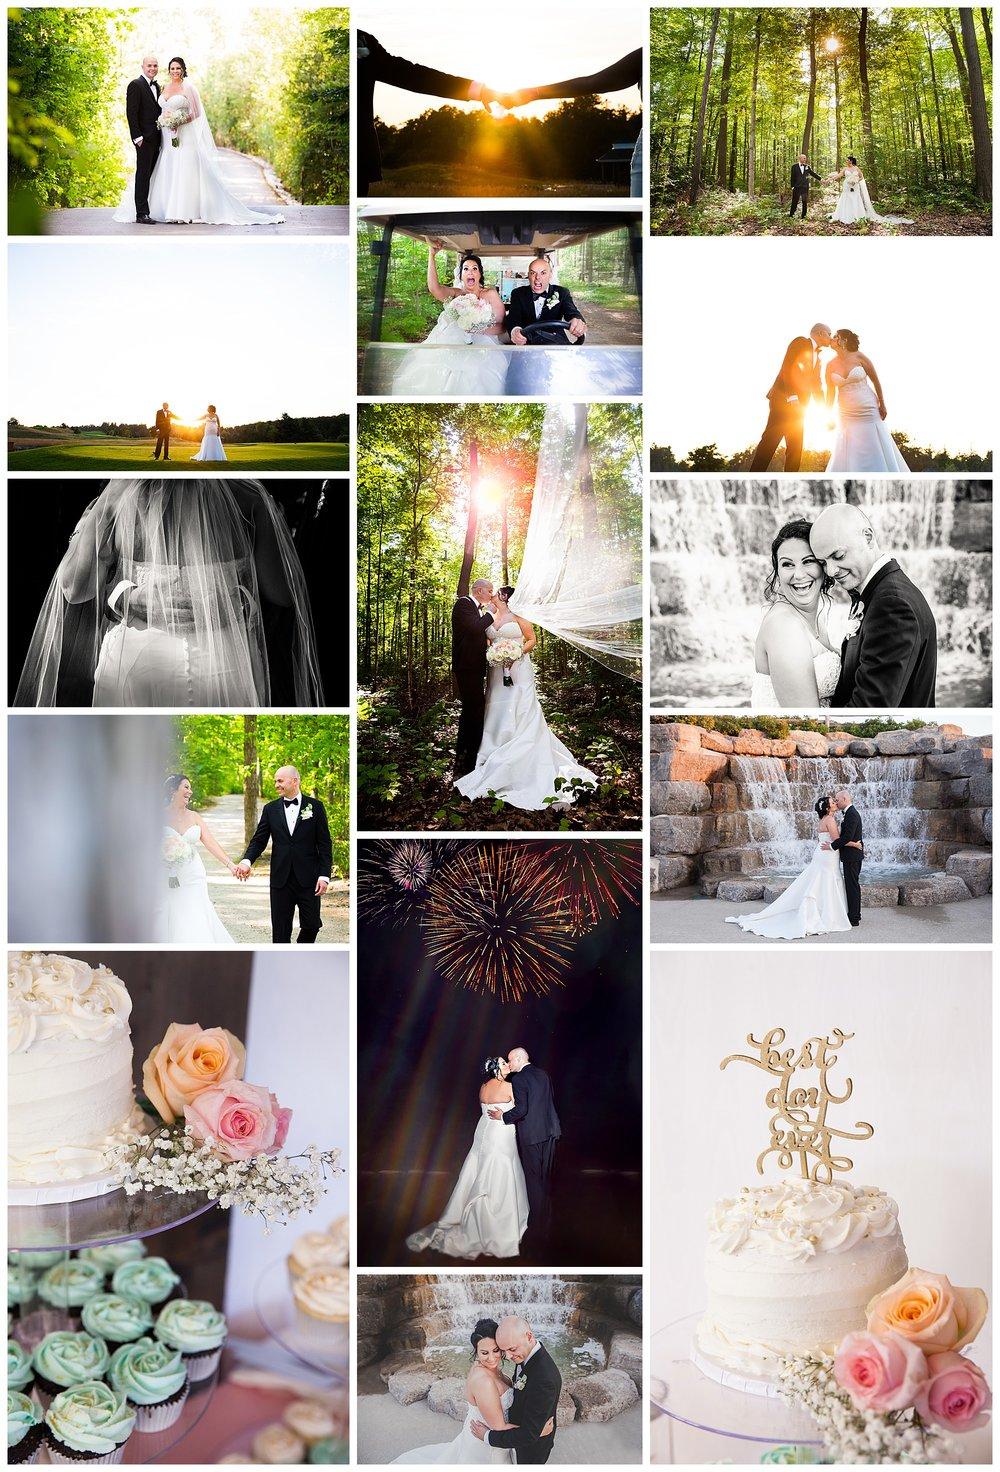 Whistle Bear Golf Club, Cambridge, Ontario wedding photos by VanDaele & Russell